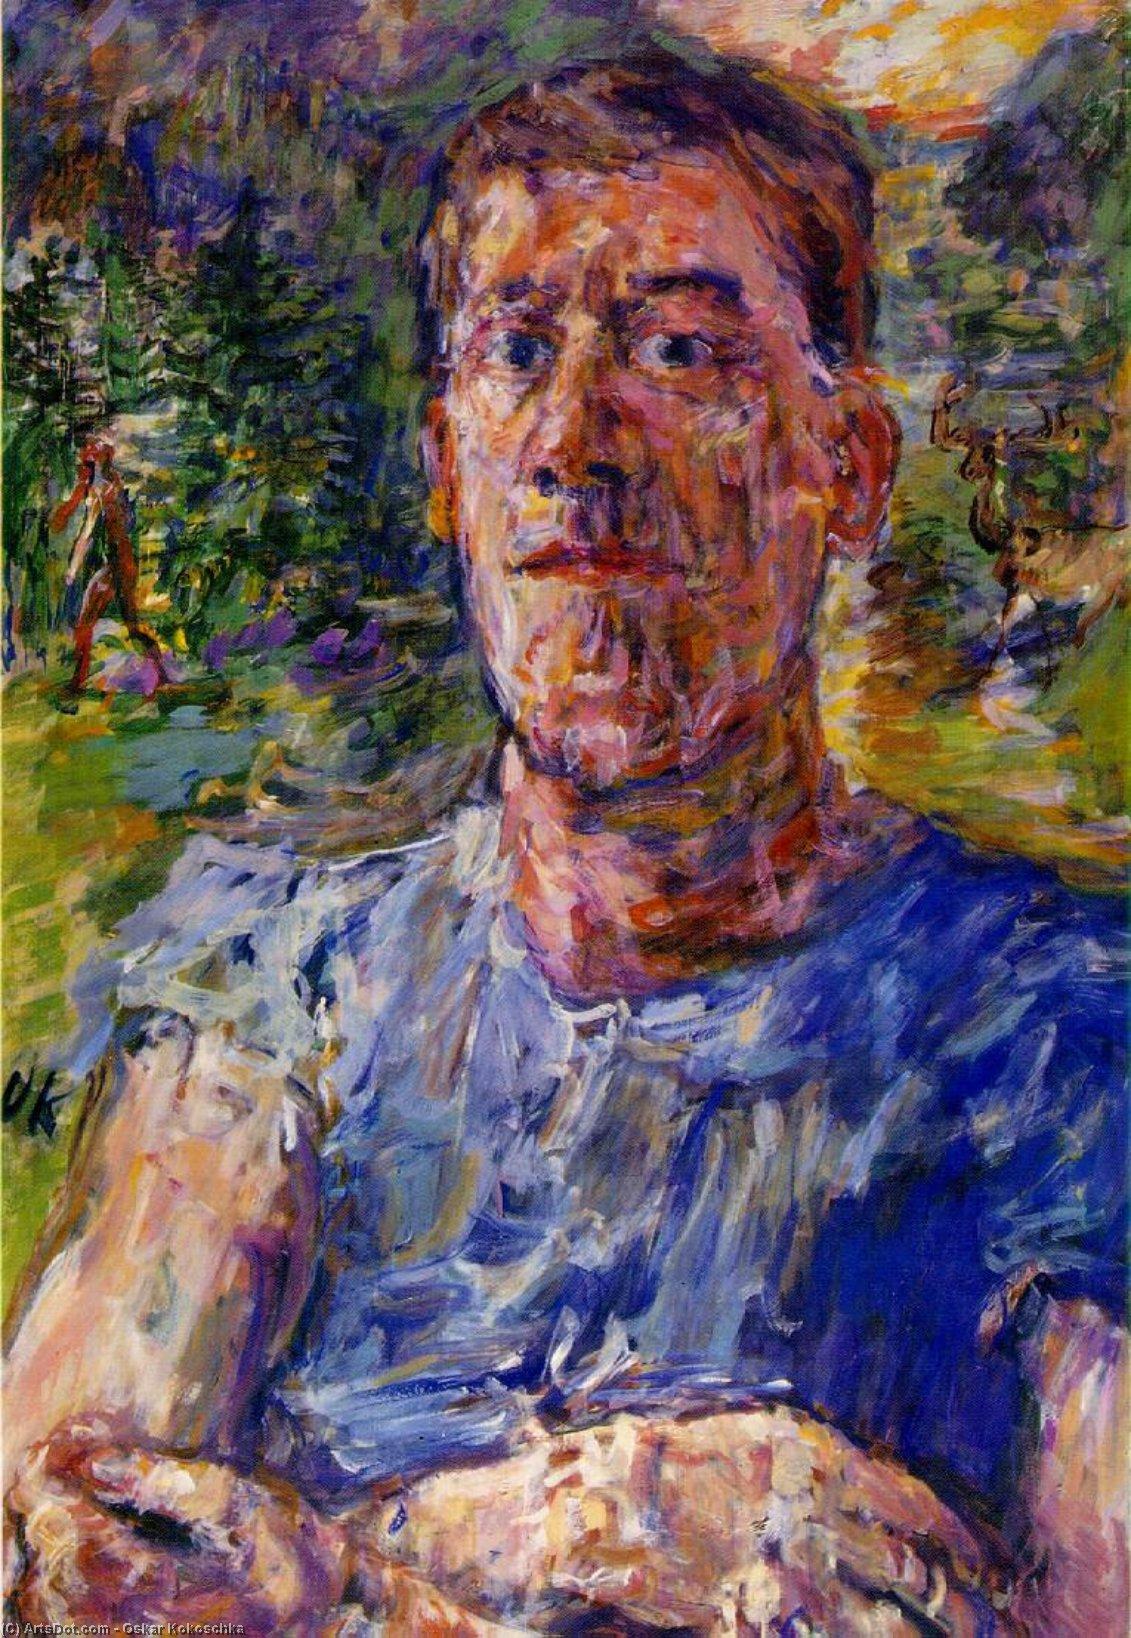 Wikioo.org - สารานุกรมวิจิตรศิลป์ - จิตรกรรม Oskar Kokoschka - Self-portrait of a 'Degenerate Artist'